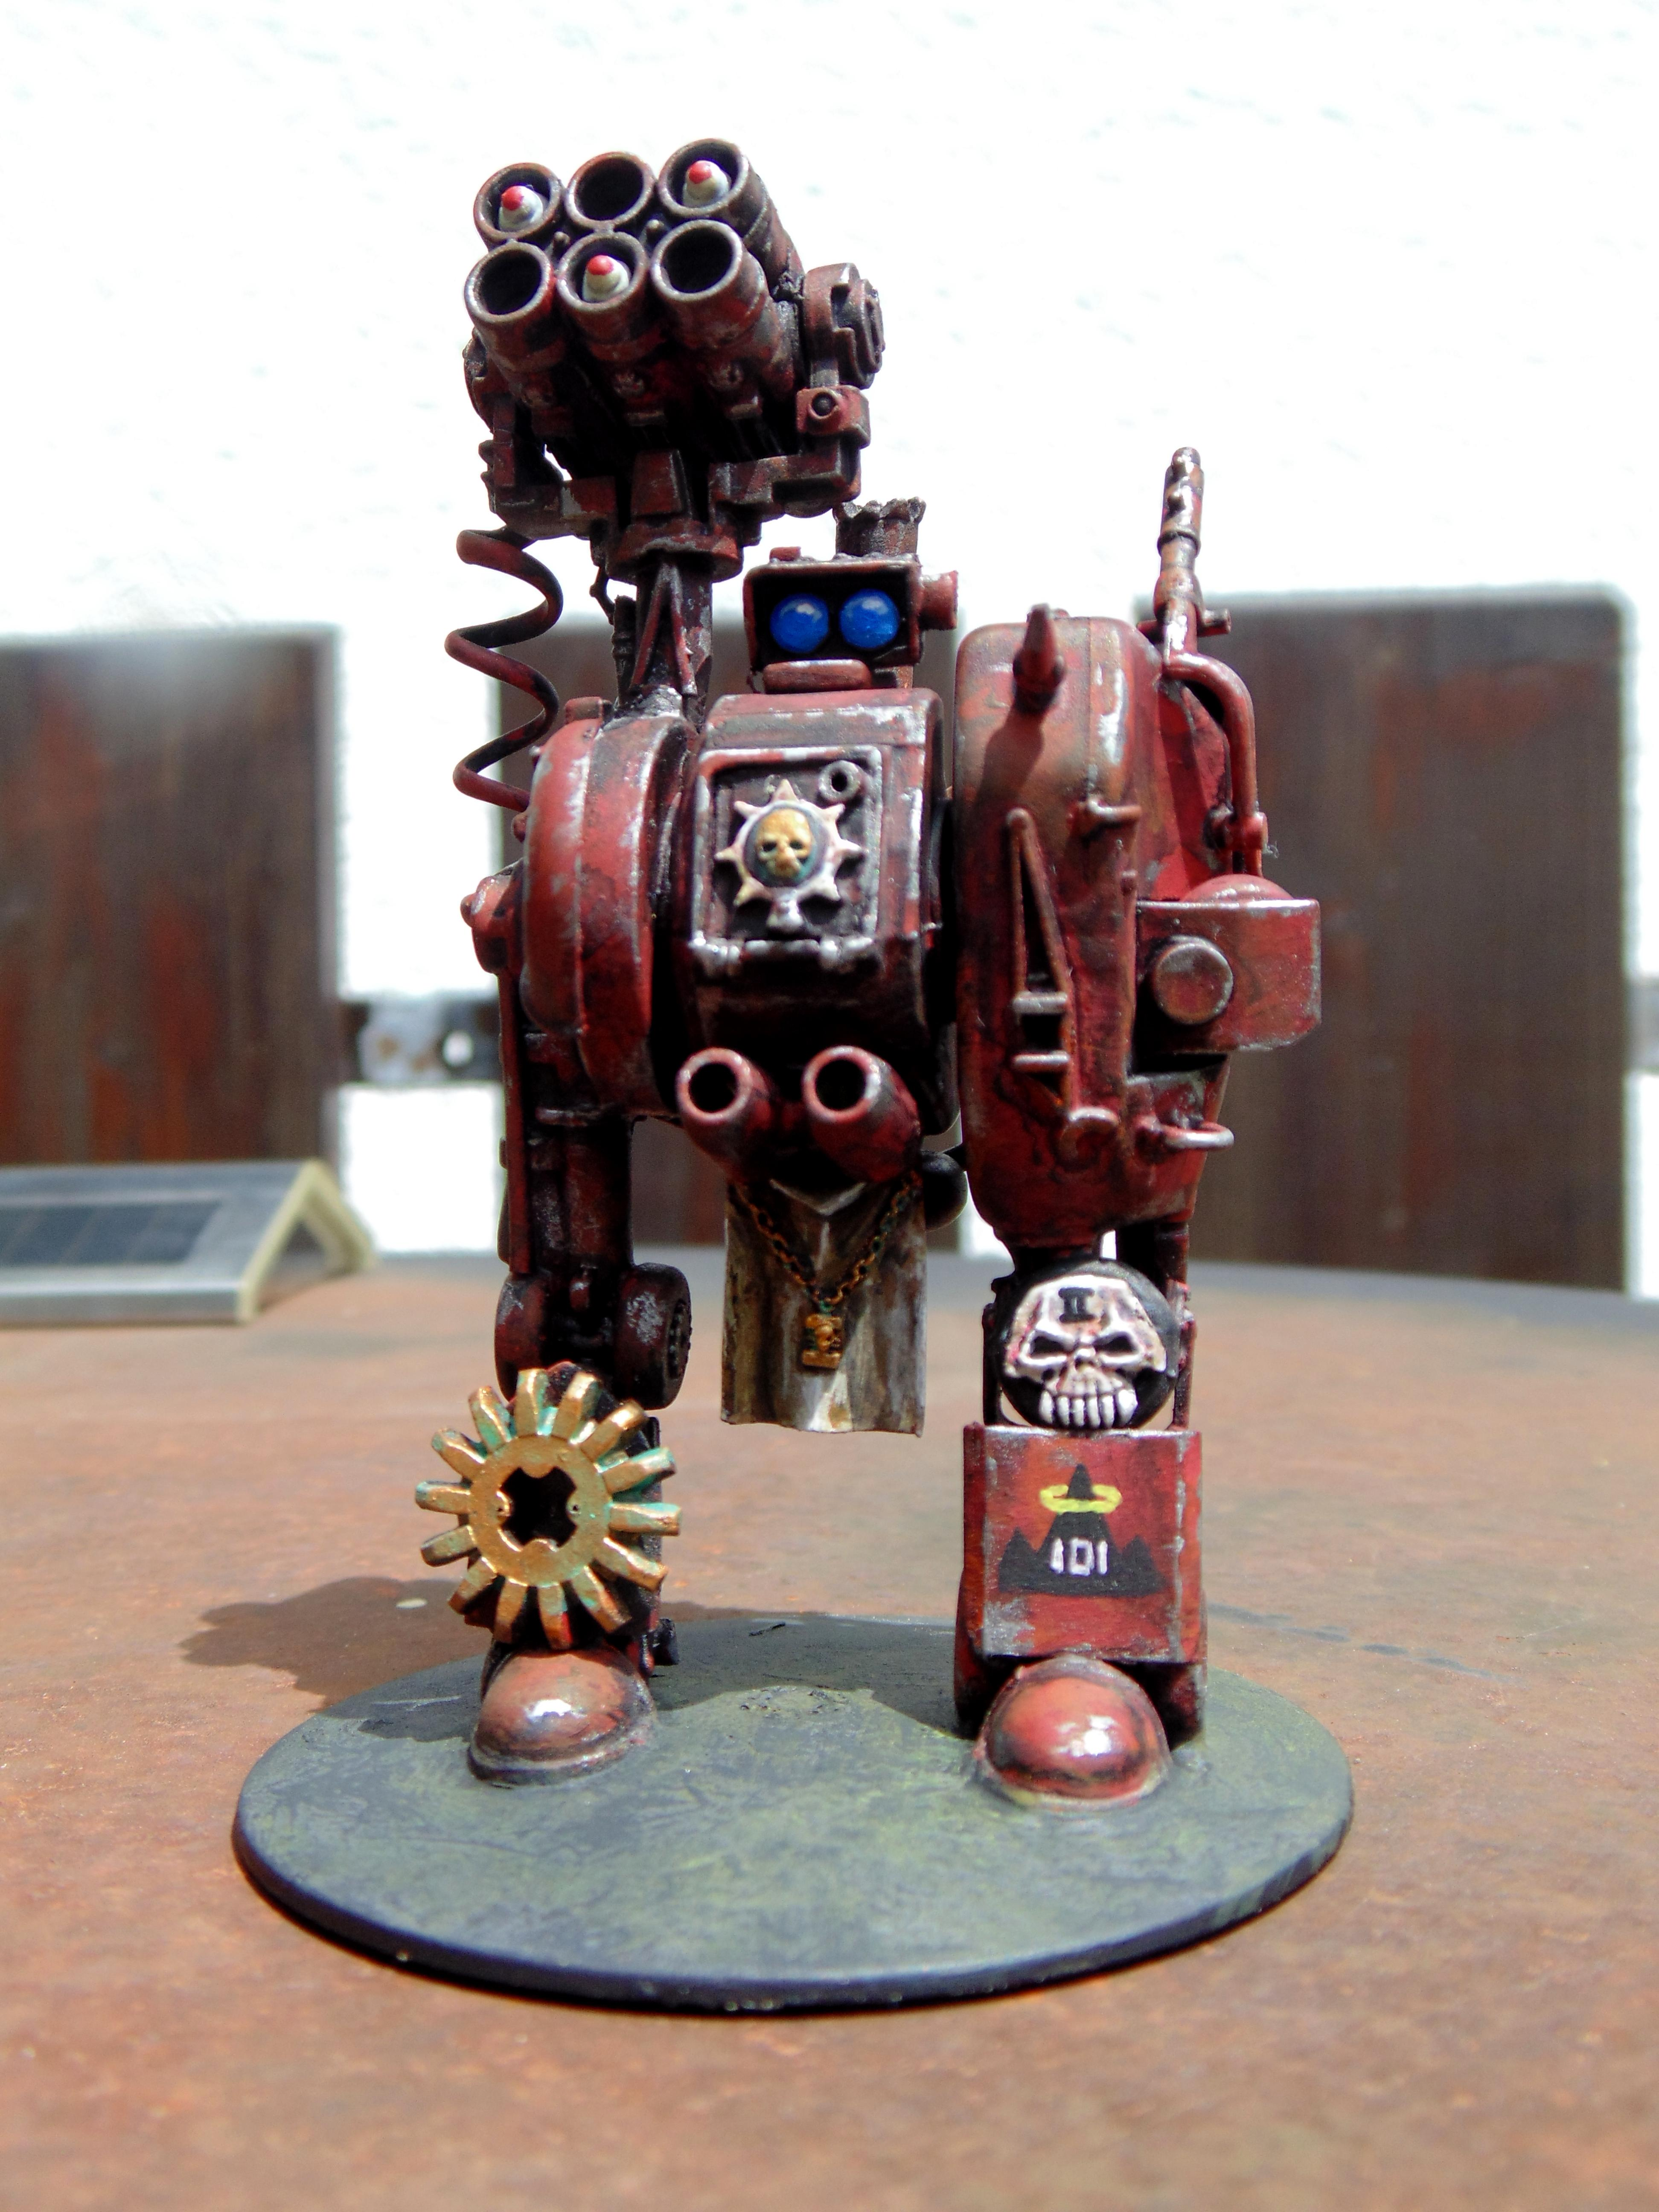 Aristikrate, Aristokrate, Arogant, Blanchitsu, Bot, Conversion, Cool, Crazy, Cube, Cyborg, Disturbing, Doom, Dreadnought, Freelancer, Group, Henchmen, Humor, Inq40k, Inquisitor, Kill, Machine, Mercenary, Merceneries, Metal, Mutant, Pirate, Repainted, Robot, Rogue, Scratch, Snob, Team, Trader, Ugly, Work In Progress